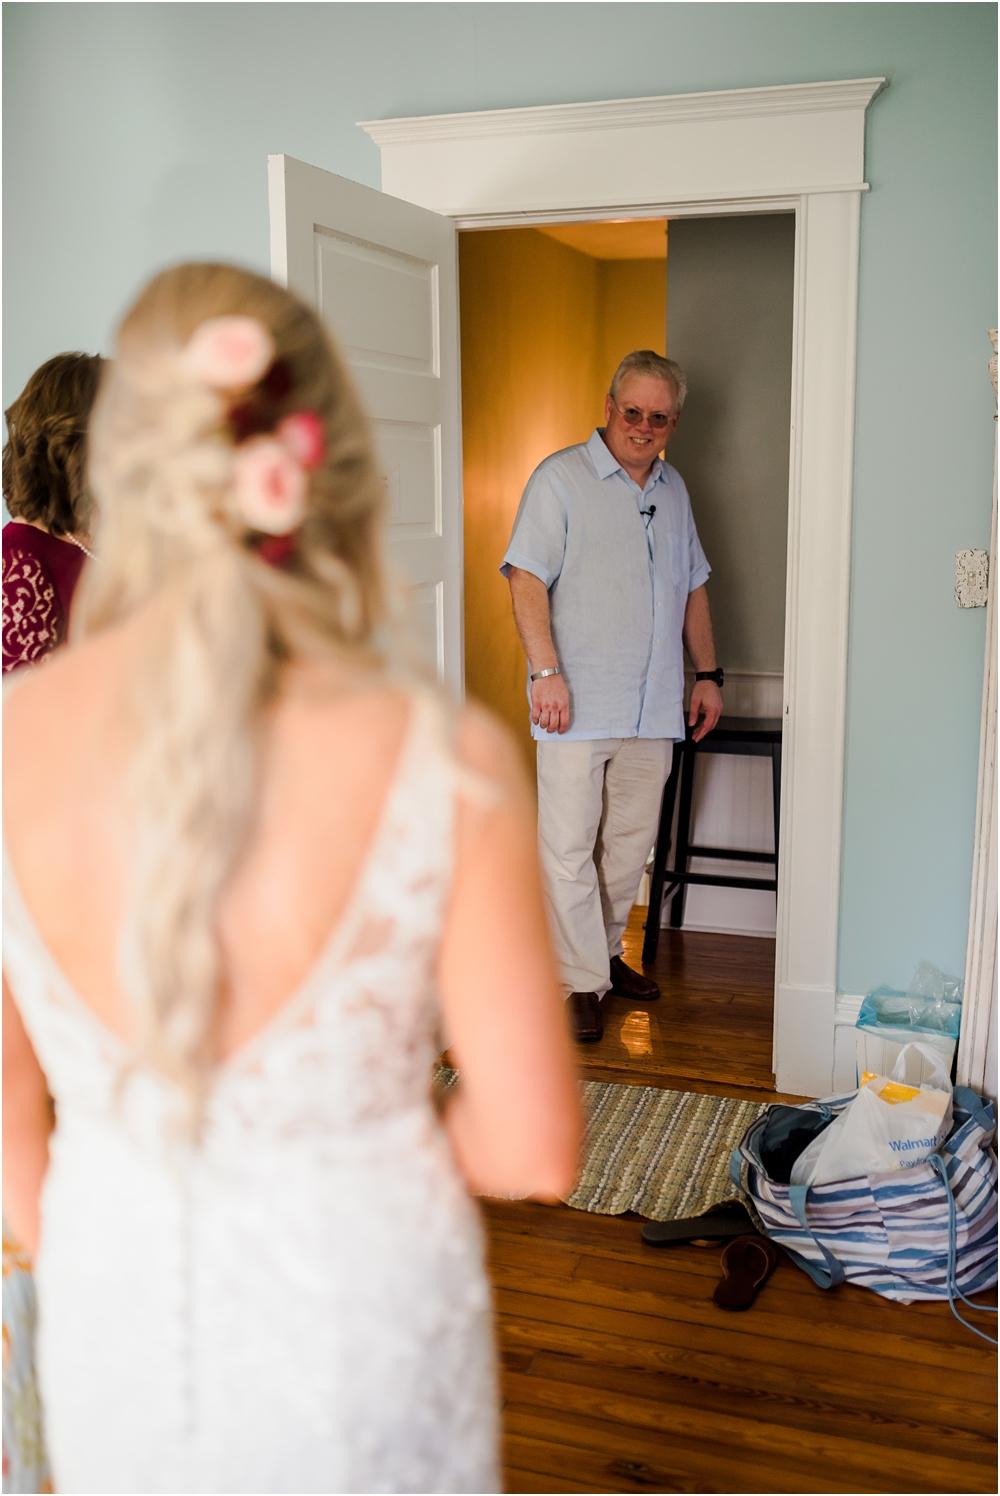 mcglothlin-wedding-kiersten-stevenson-photography-30a-panama-city-beach-dothan-tallahassee-(39-of-145).jpg